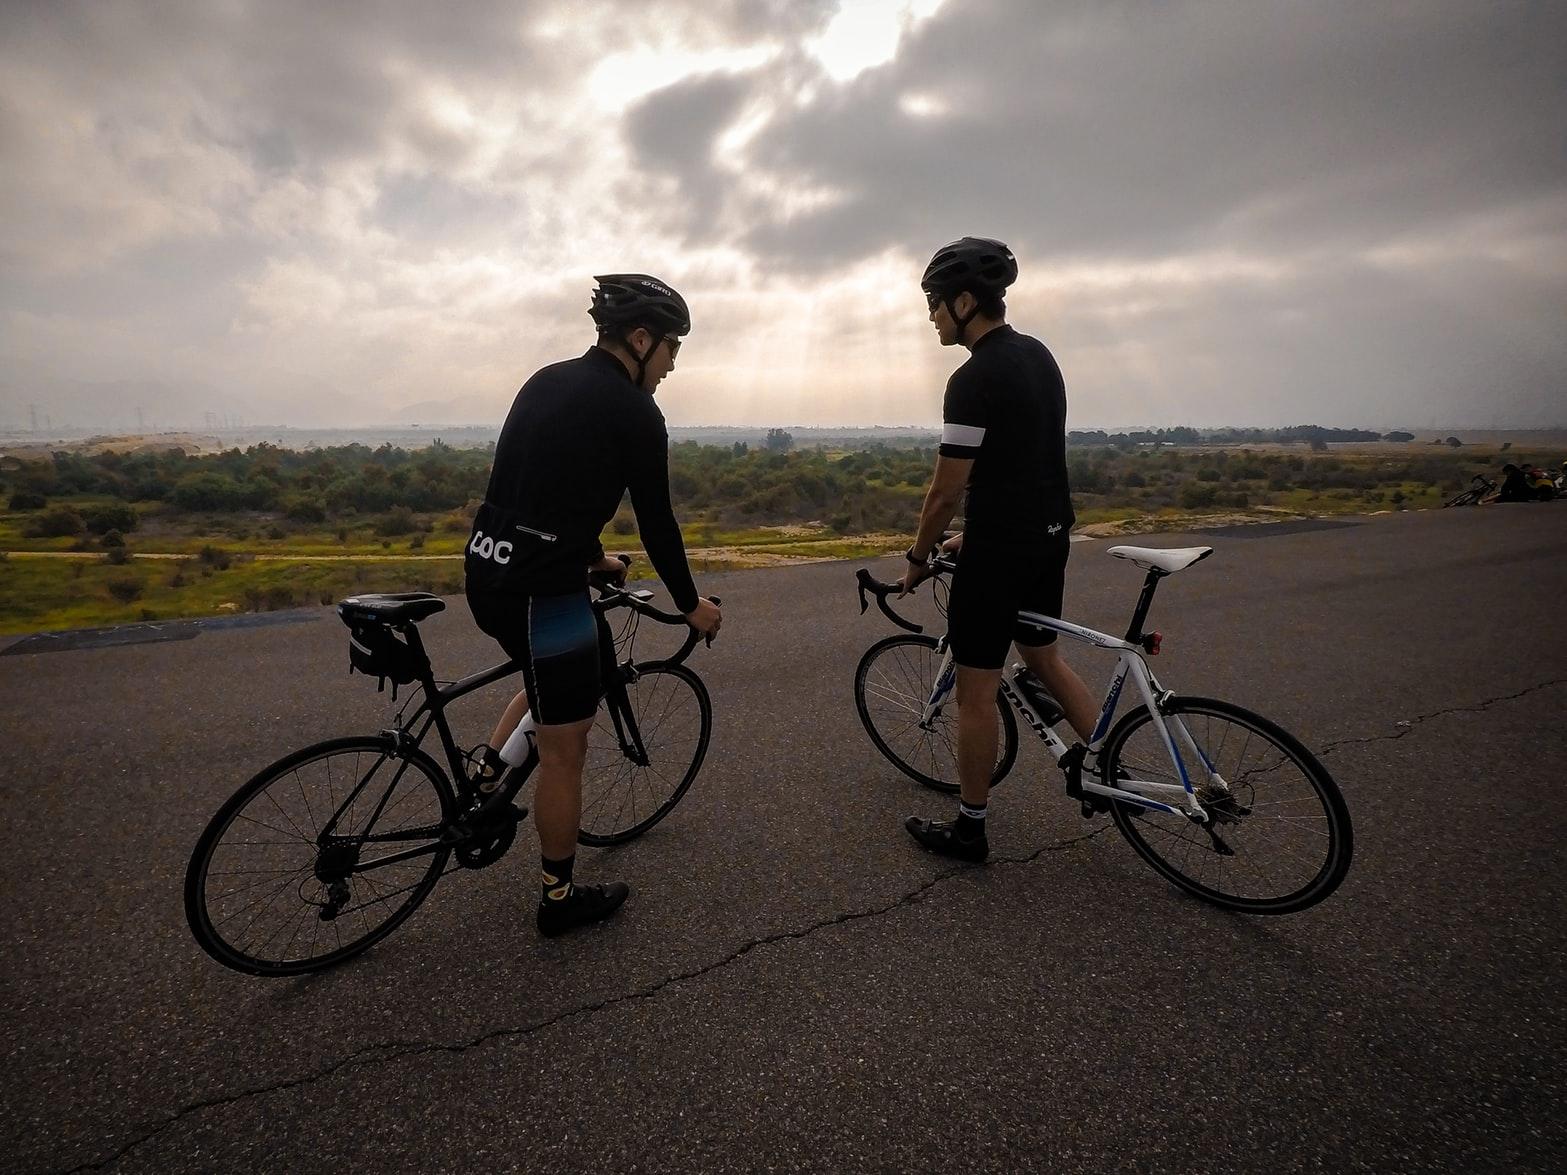 4 Road Bikes De Entrada Para Voce Comecar A Praticar